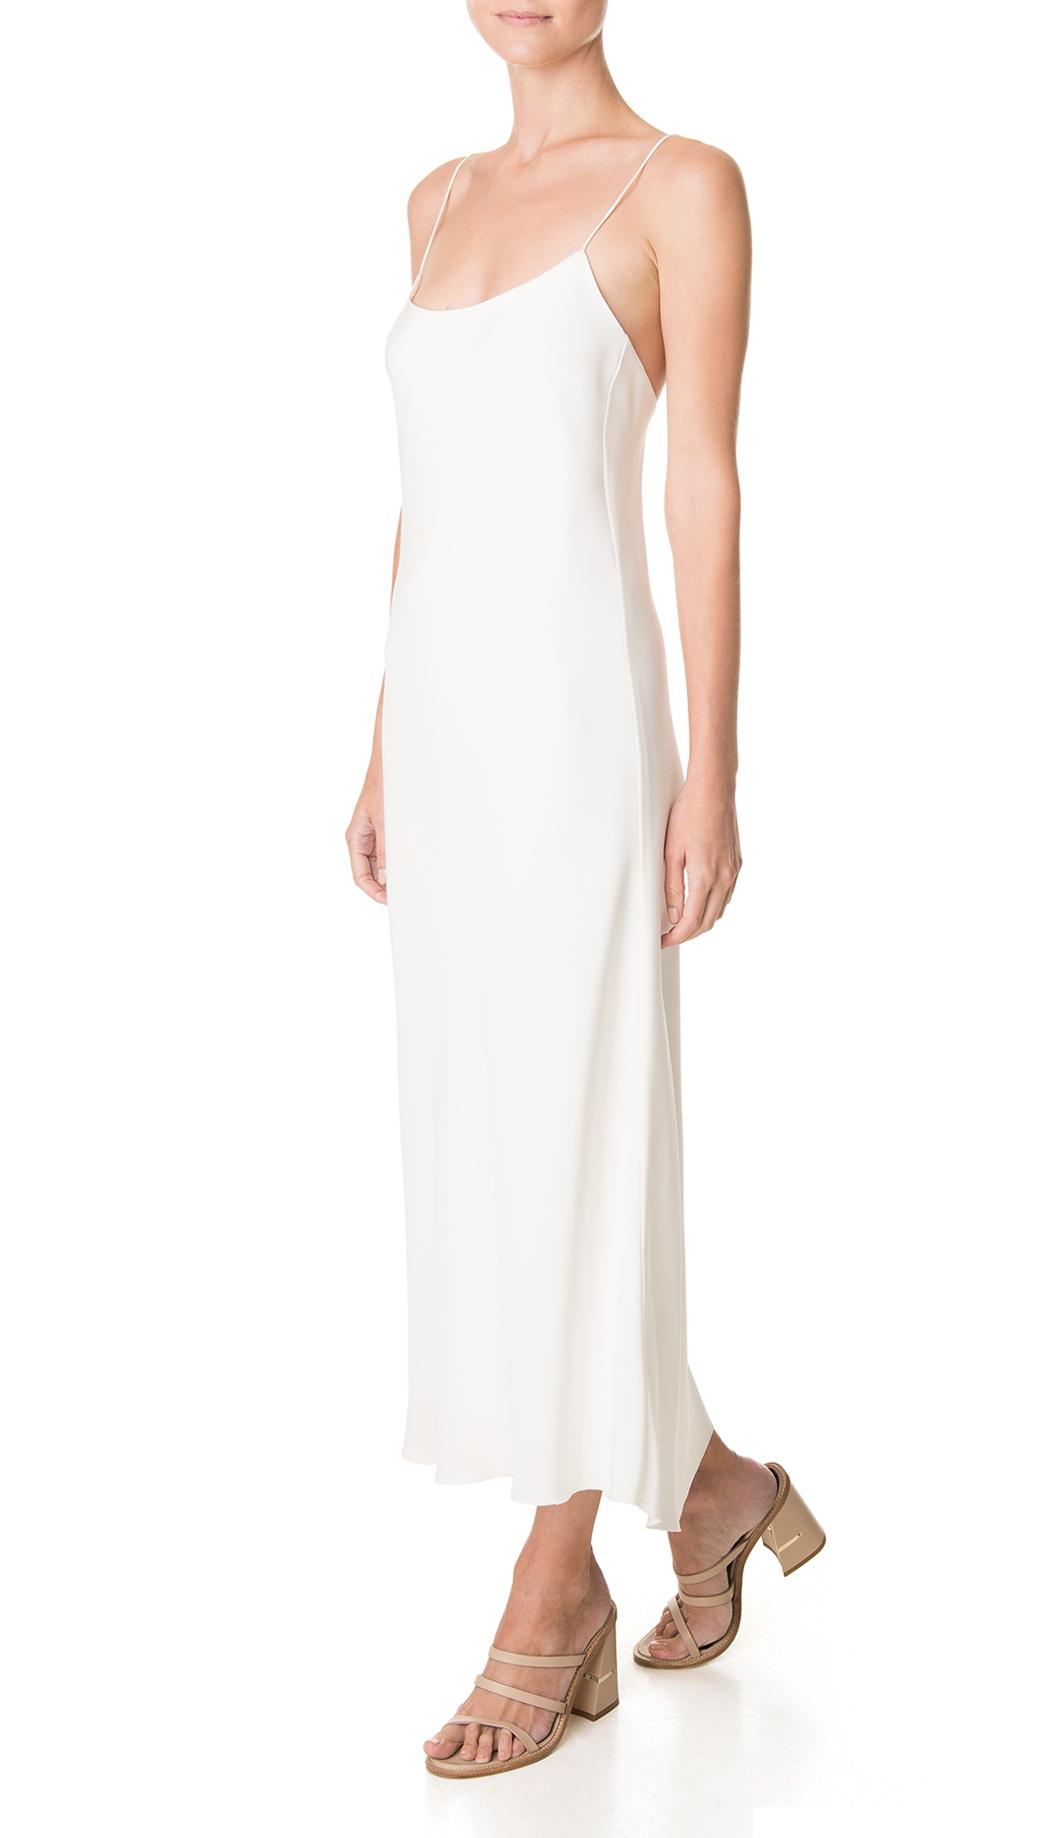 Lyst - Tibi Silk Bias Slip Dress in White